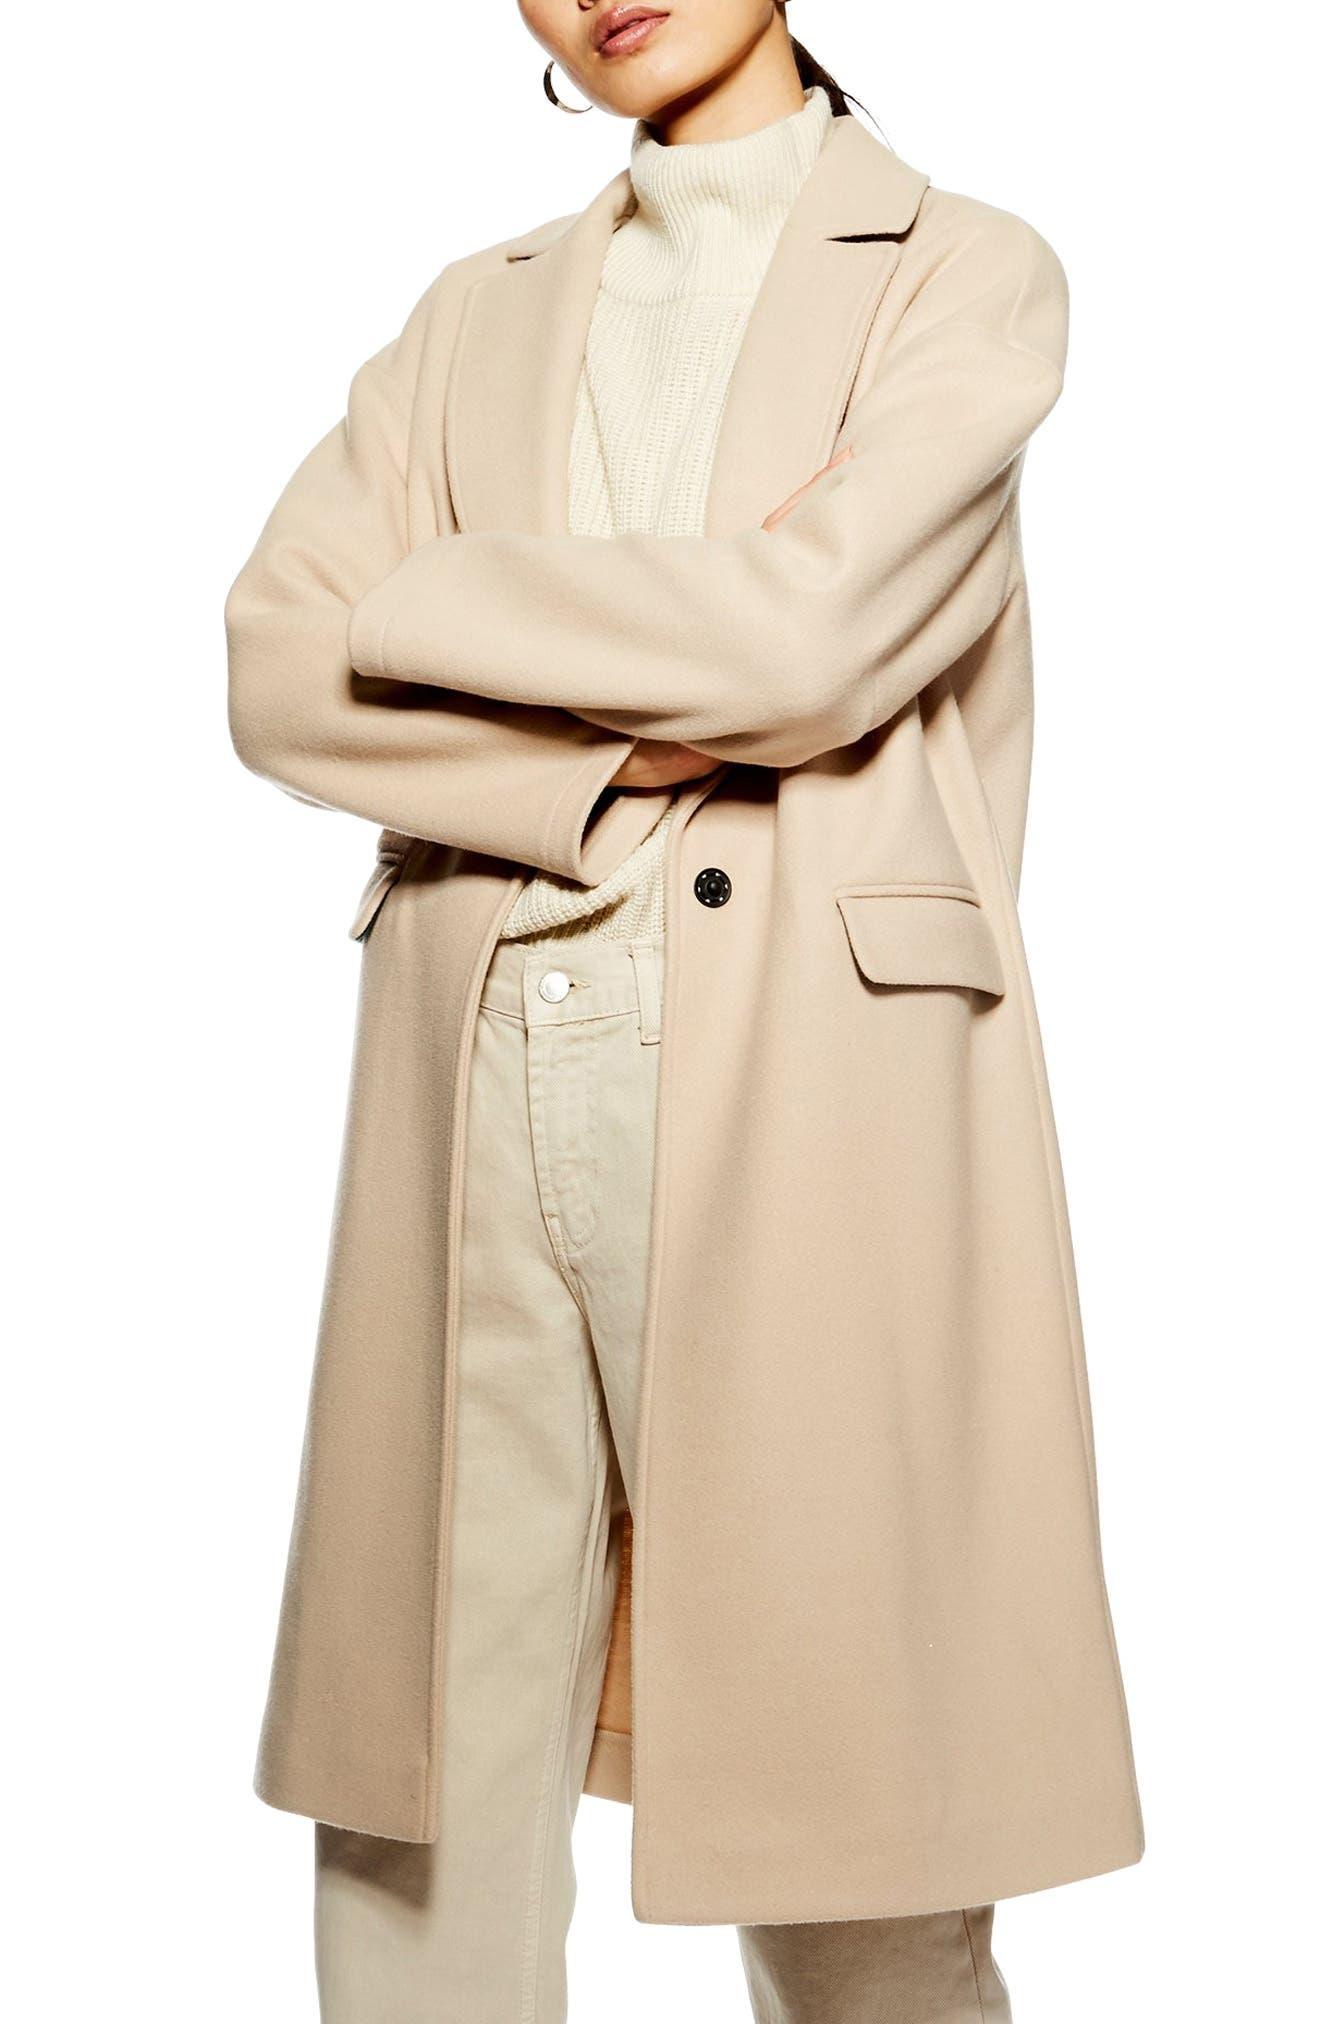 Lily Knit Back Midi Coat, Main, color, 250